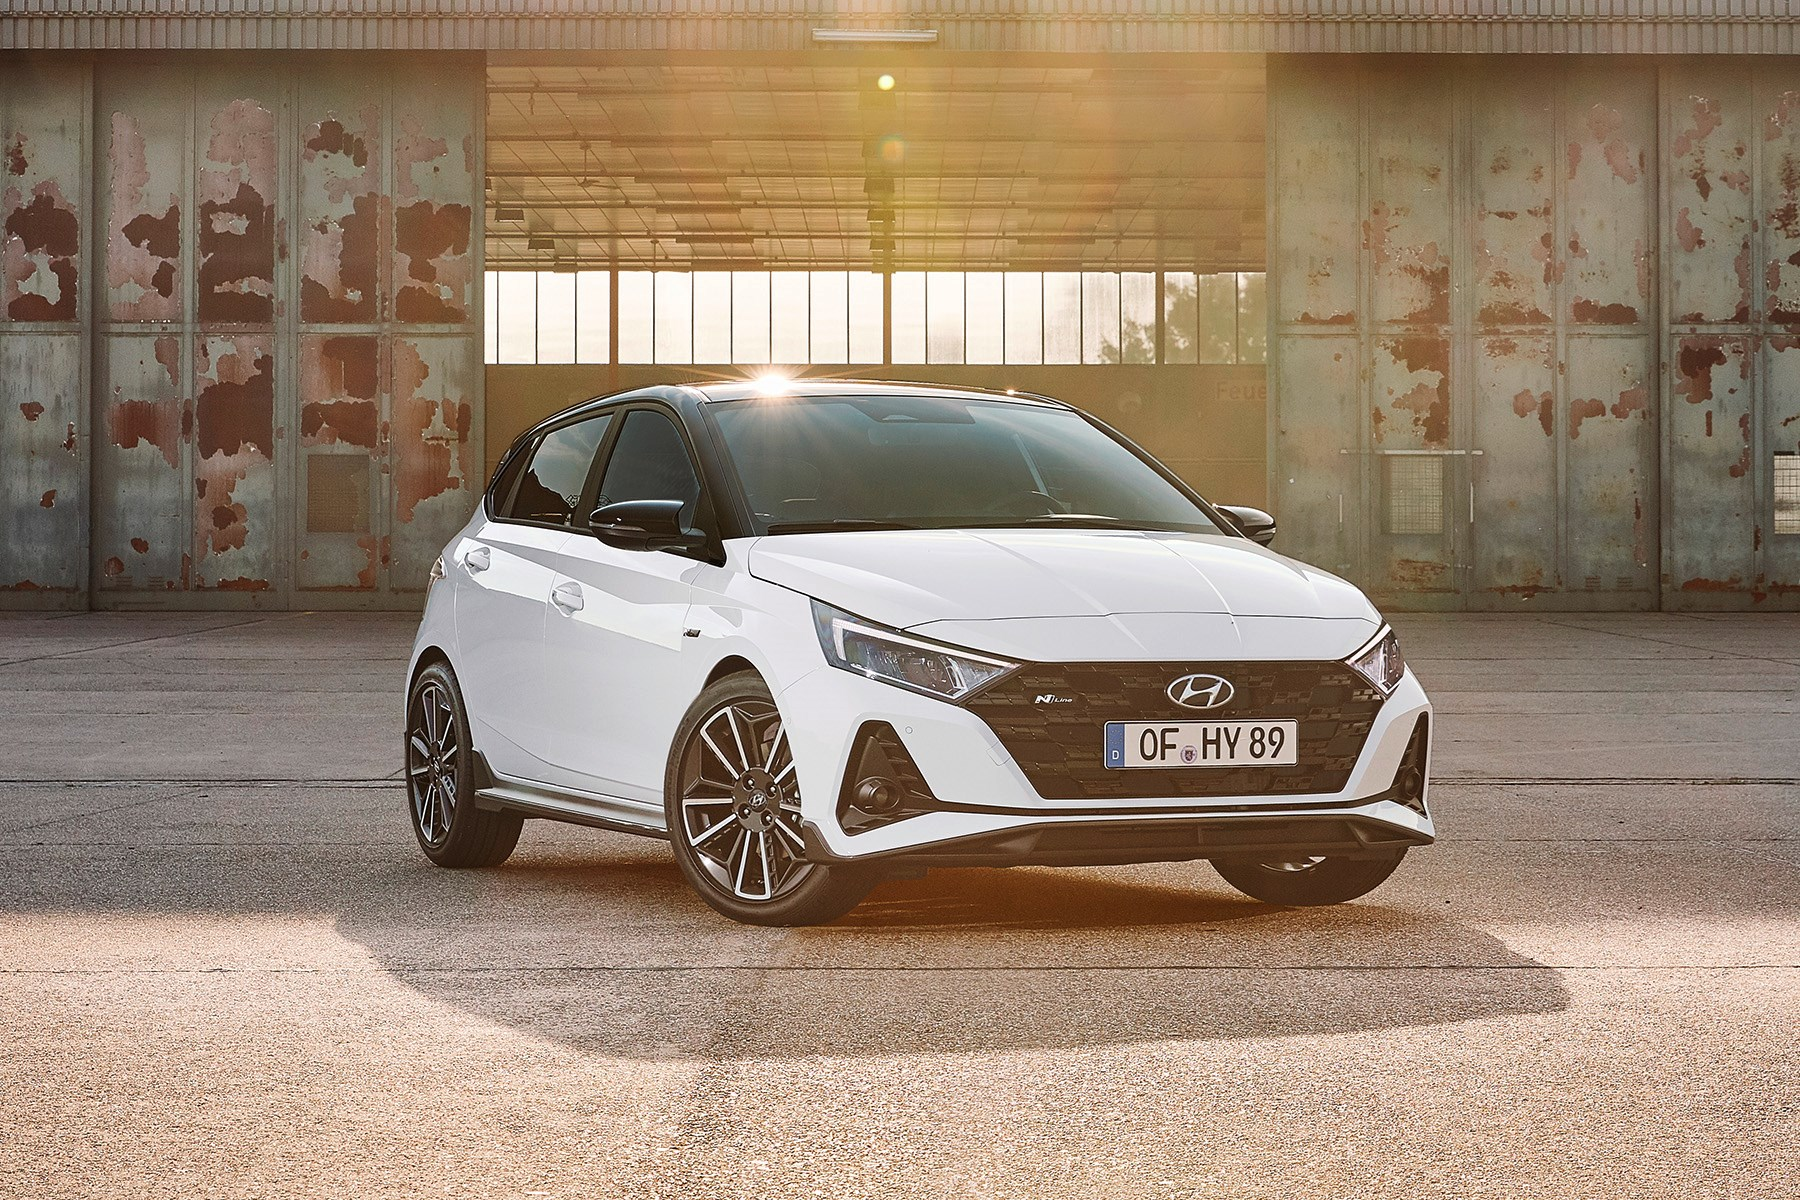 Kelebihan Kekurangan Toyota I20 Harga